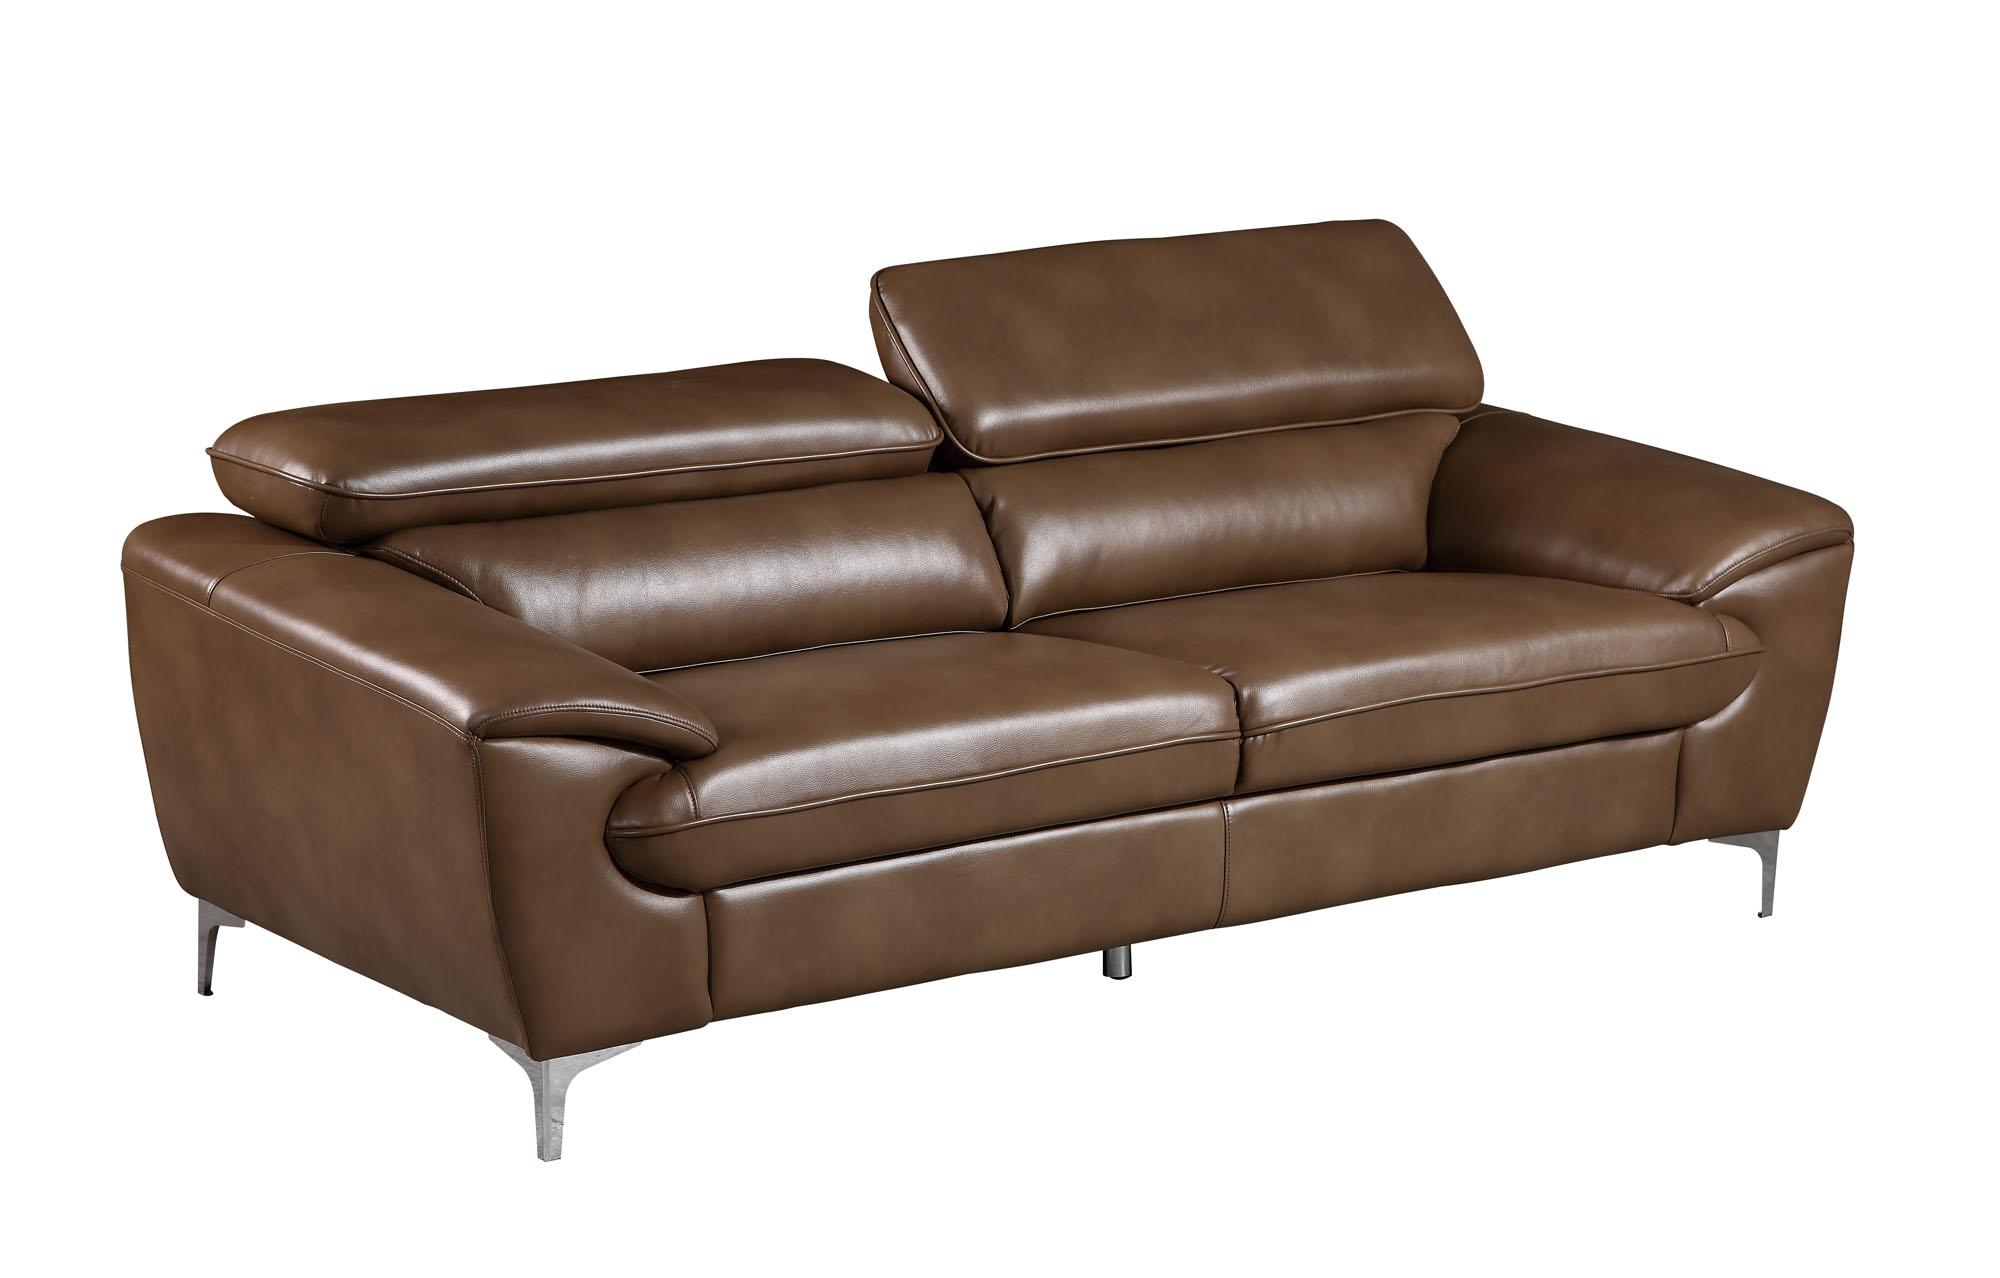 U7870 Walnut Leather Gel Sofa by Global Furniture